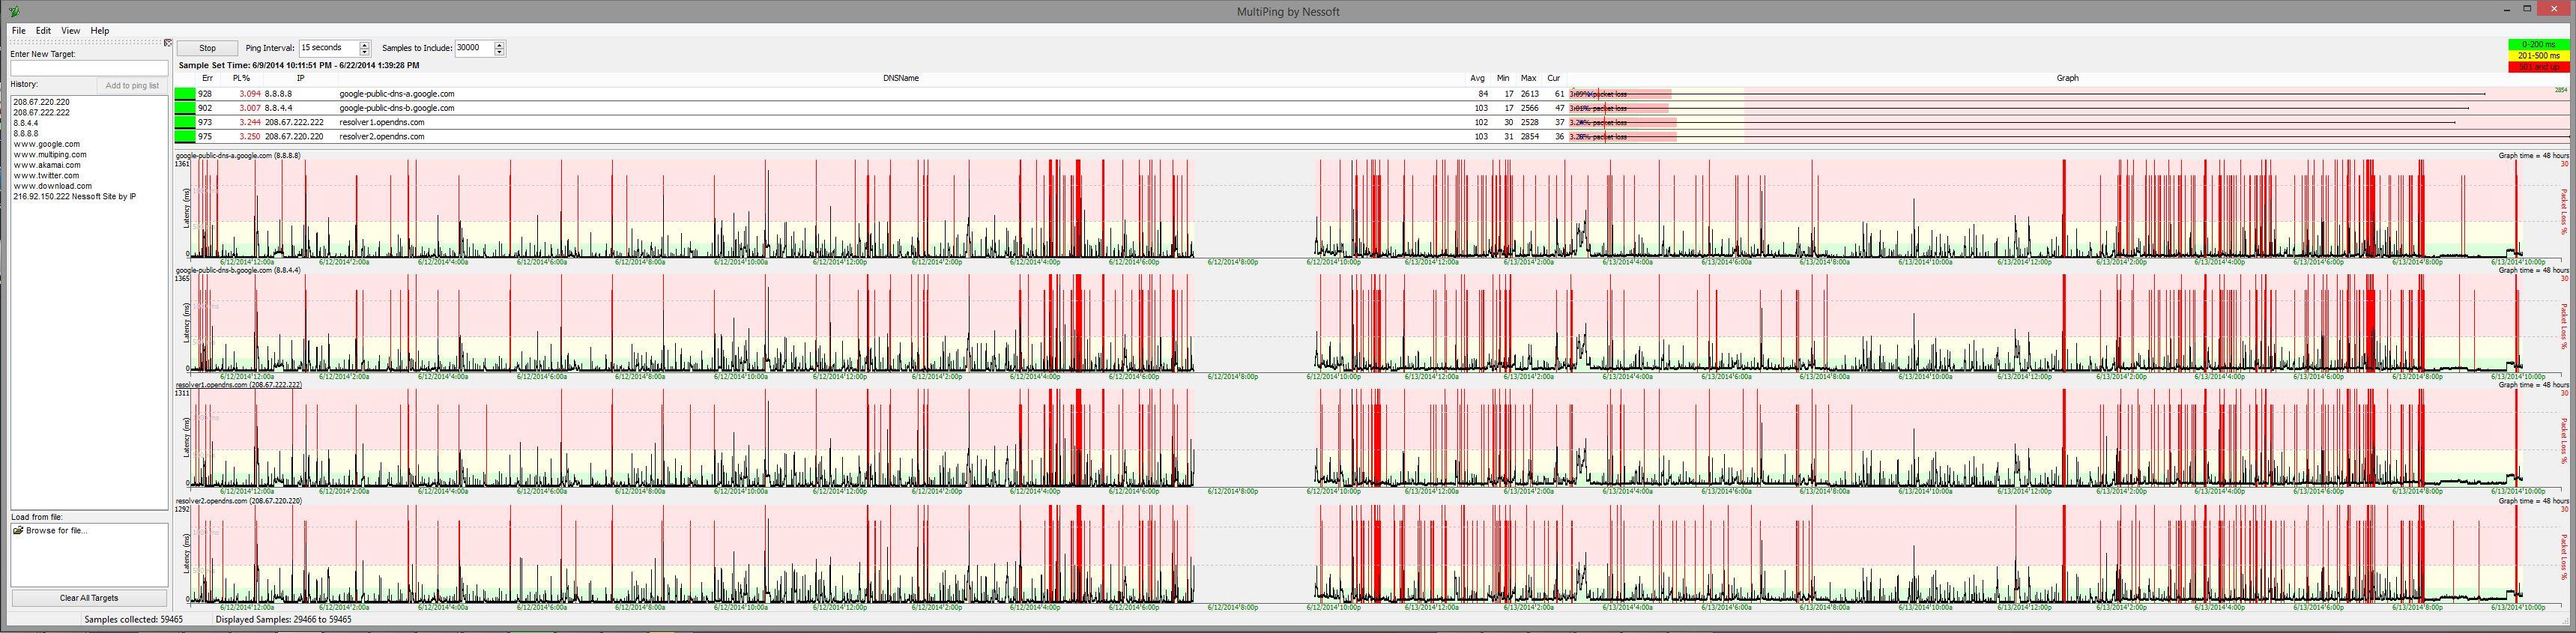 Comcast-Multiping 3.JPG